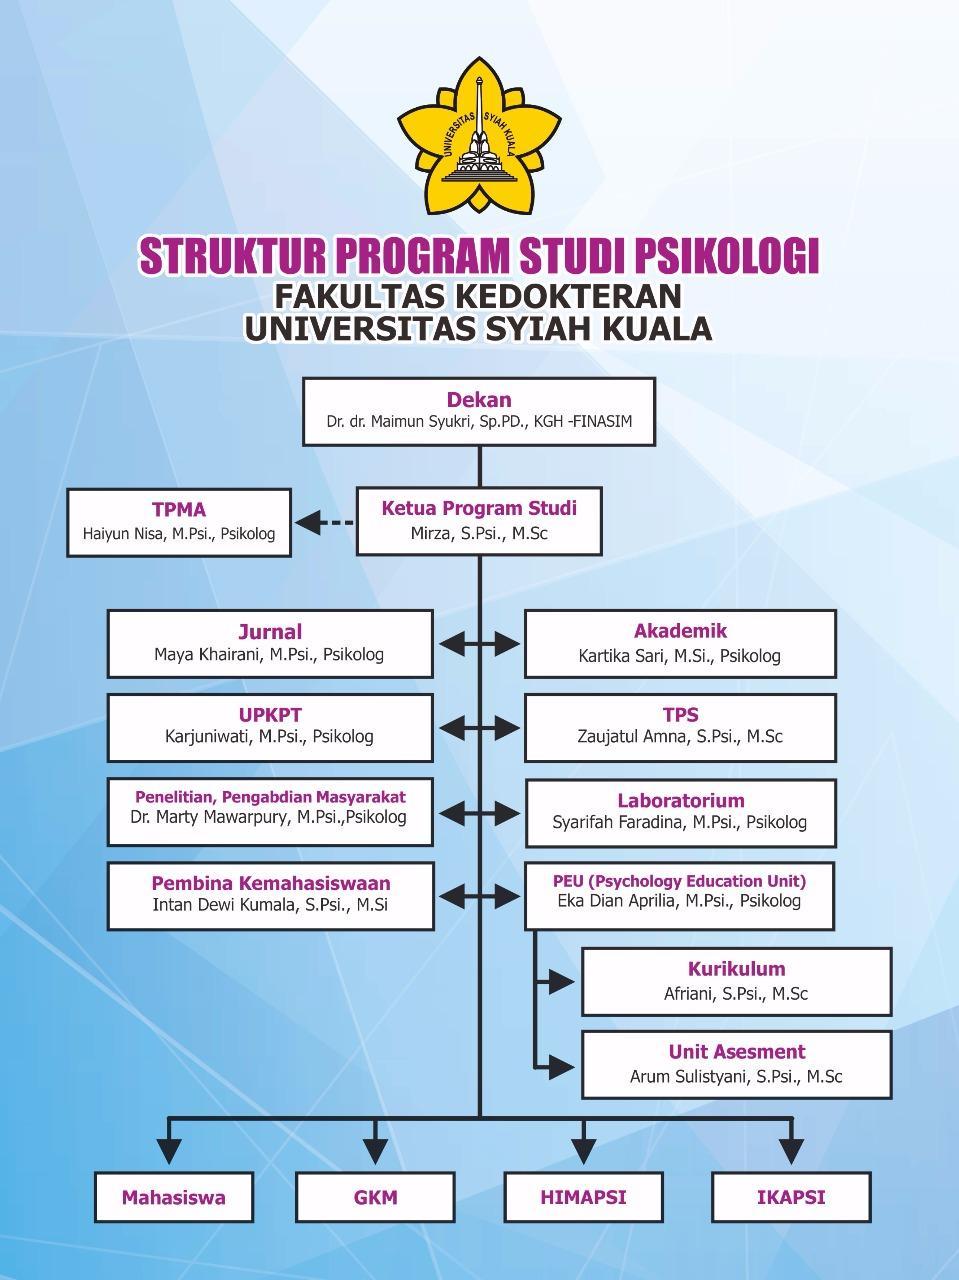 Struktur Organisasi Psikologi Fakultas Kedokteran